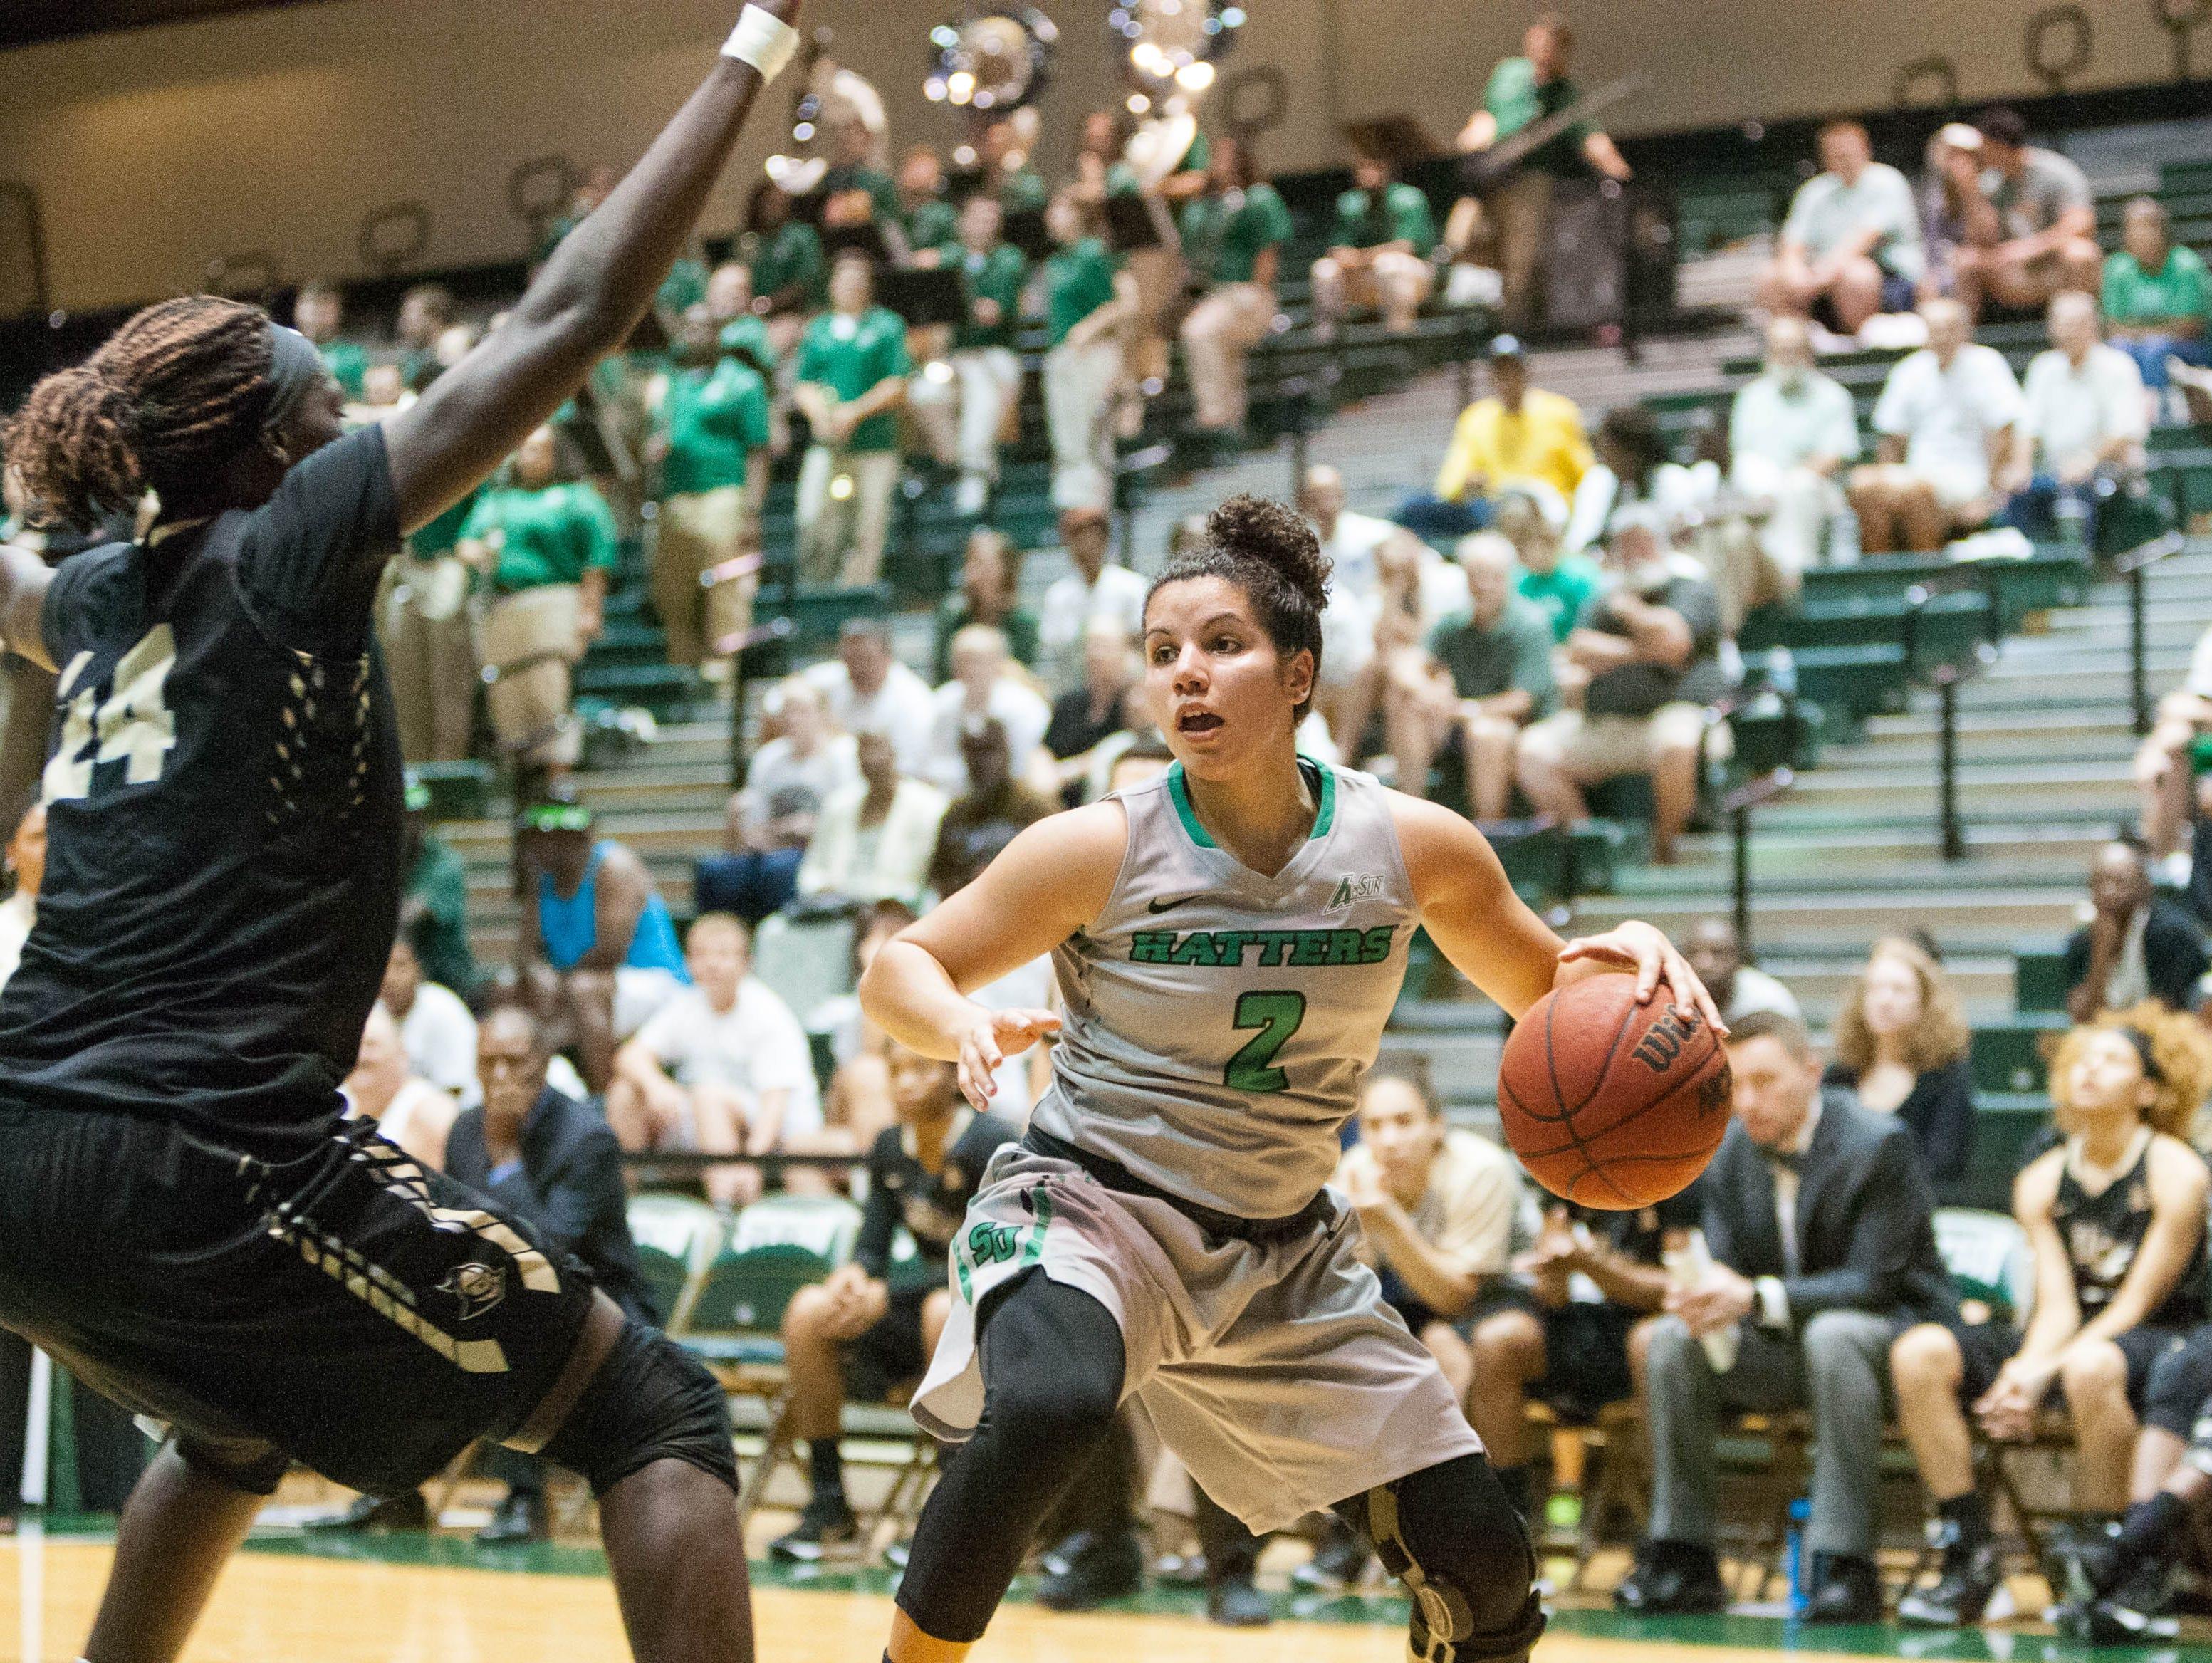 McKenna Beach has been contributing to the Stetson University women's basketball team as a freshman.